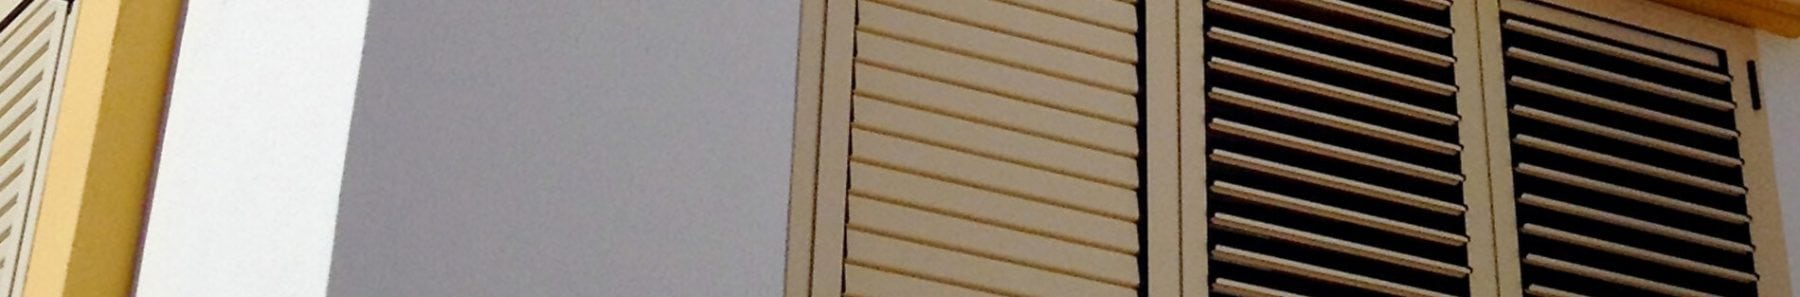 shutters along a wall